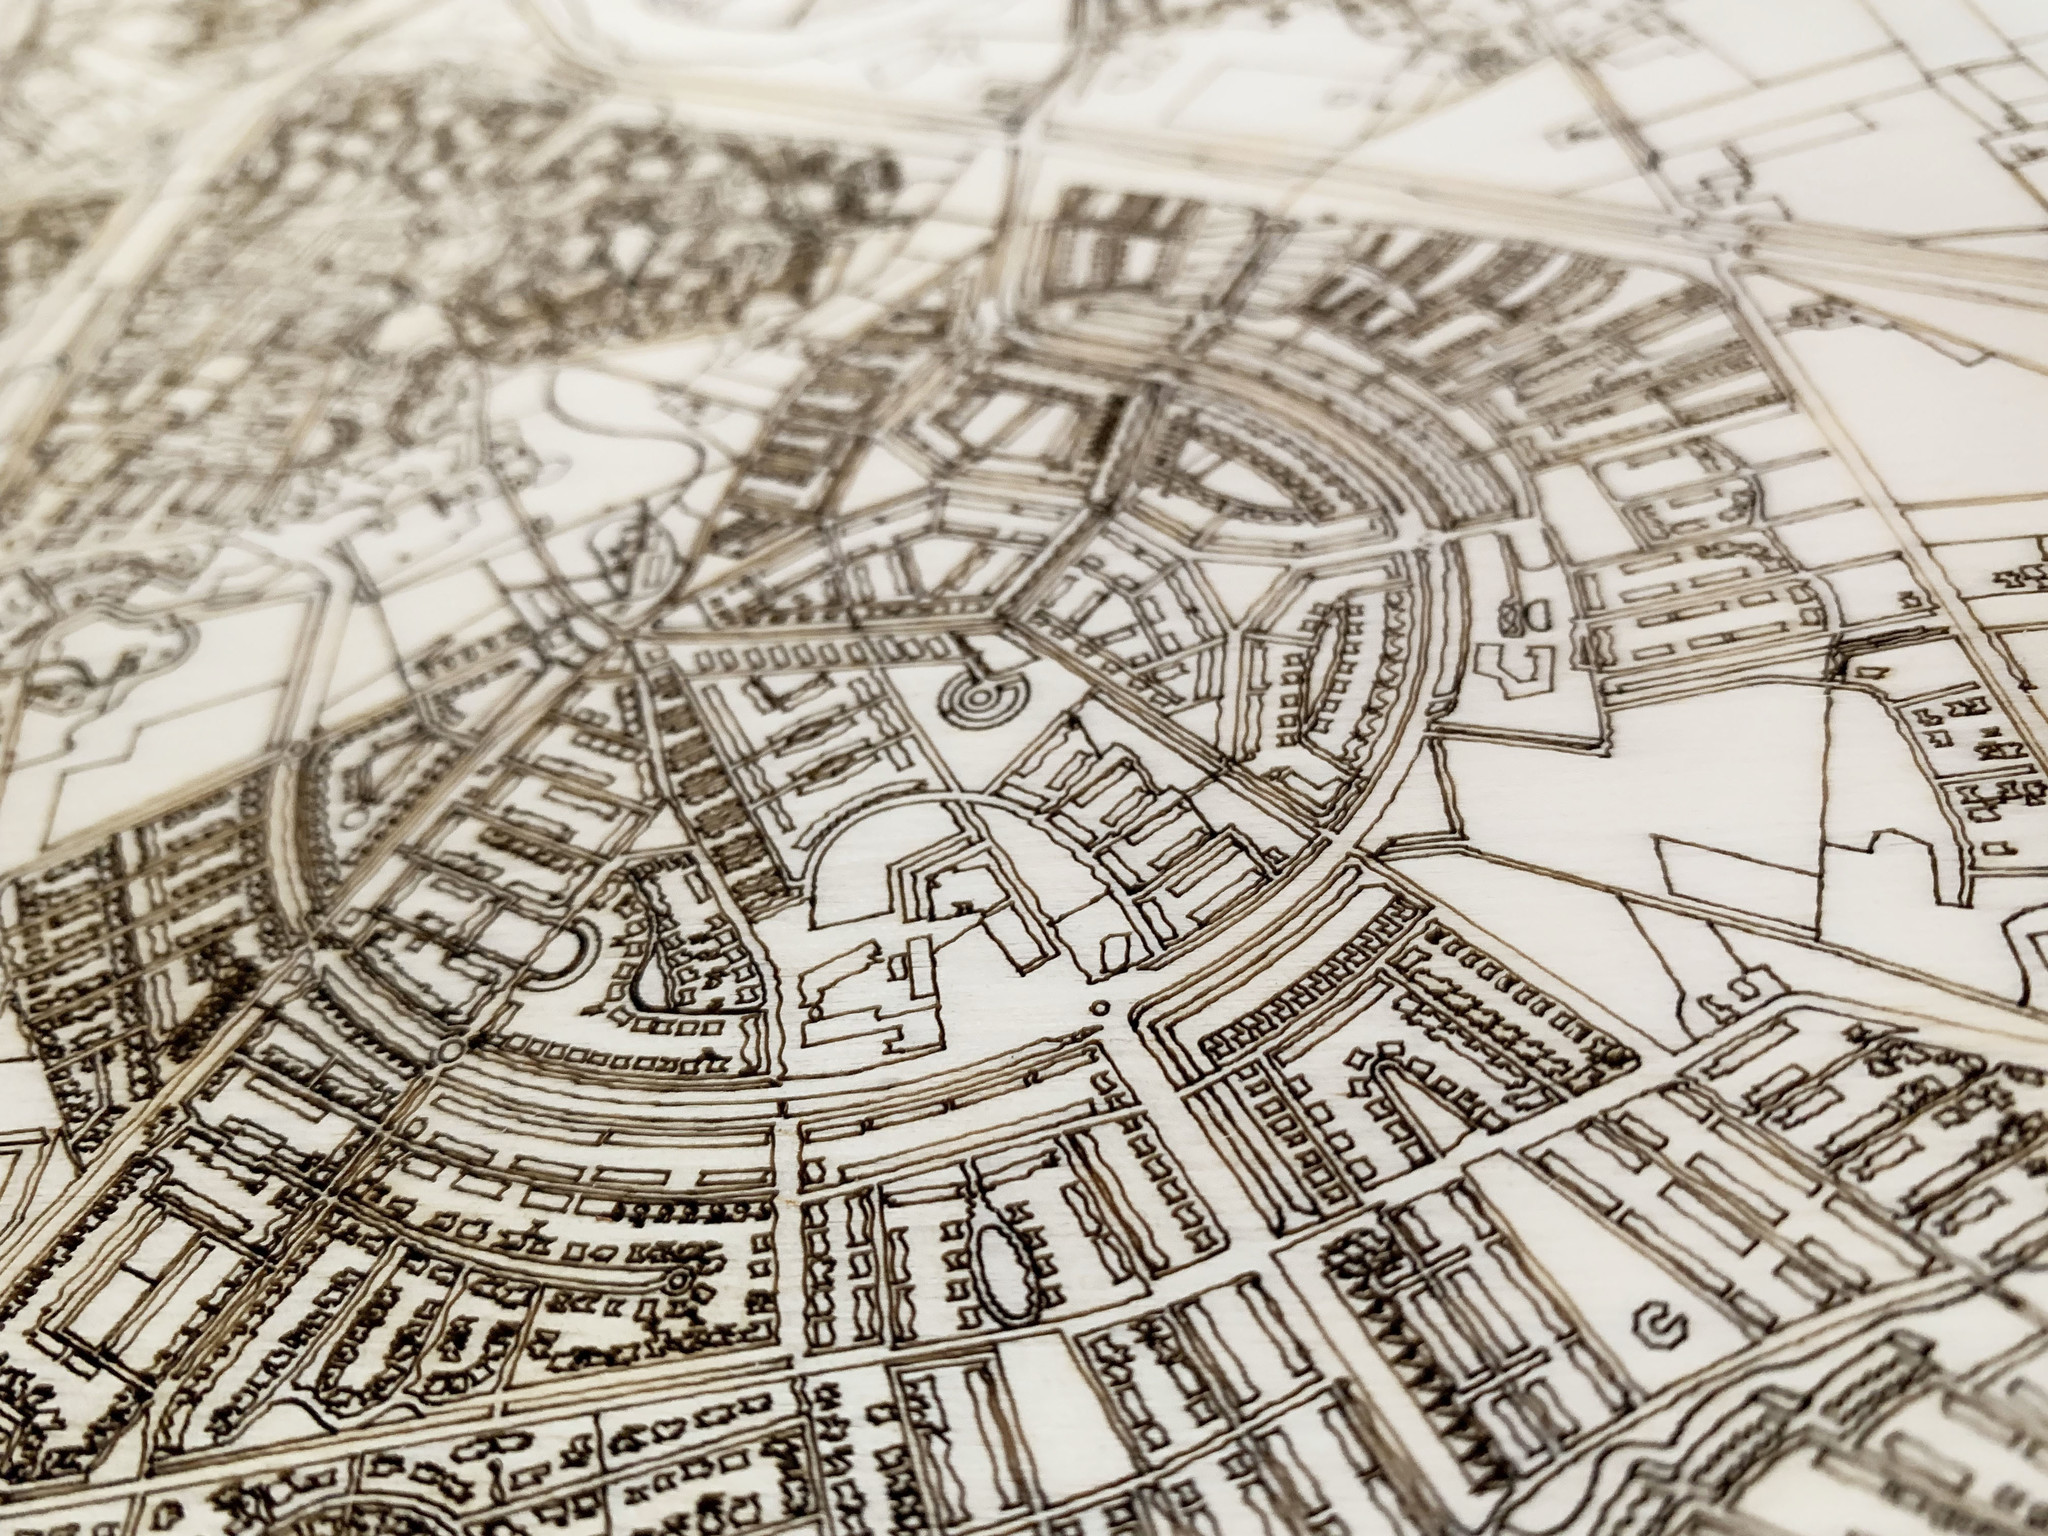 Houten stadsplattegrond Utrecht-3